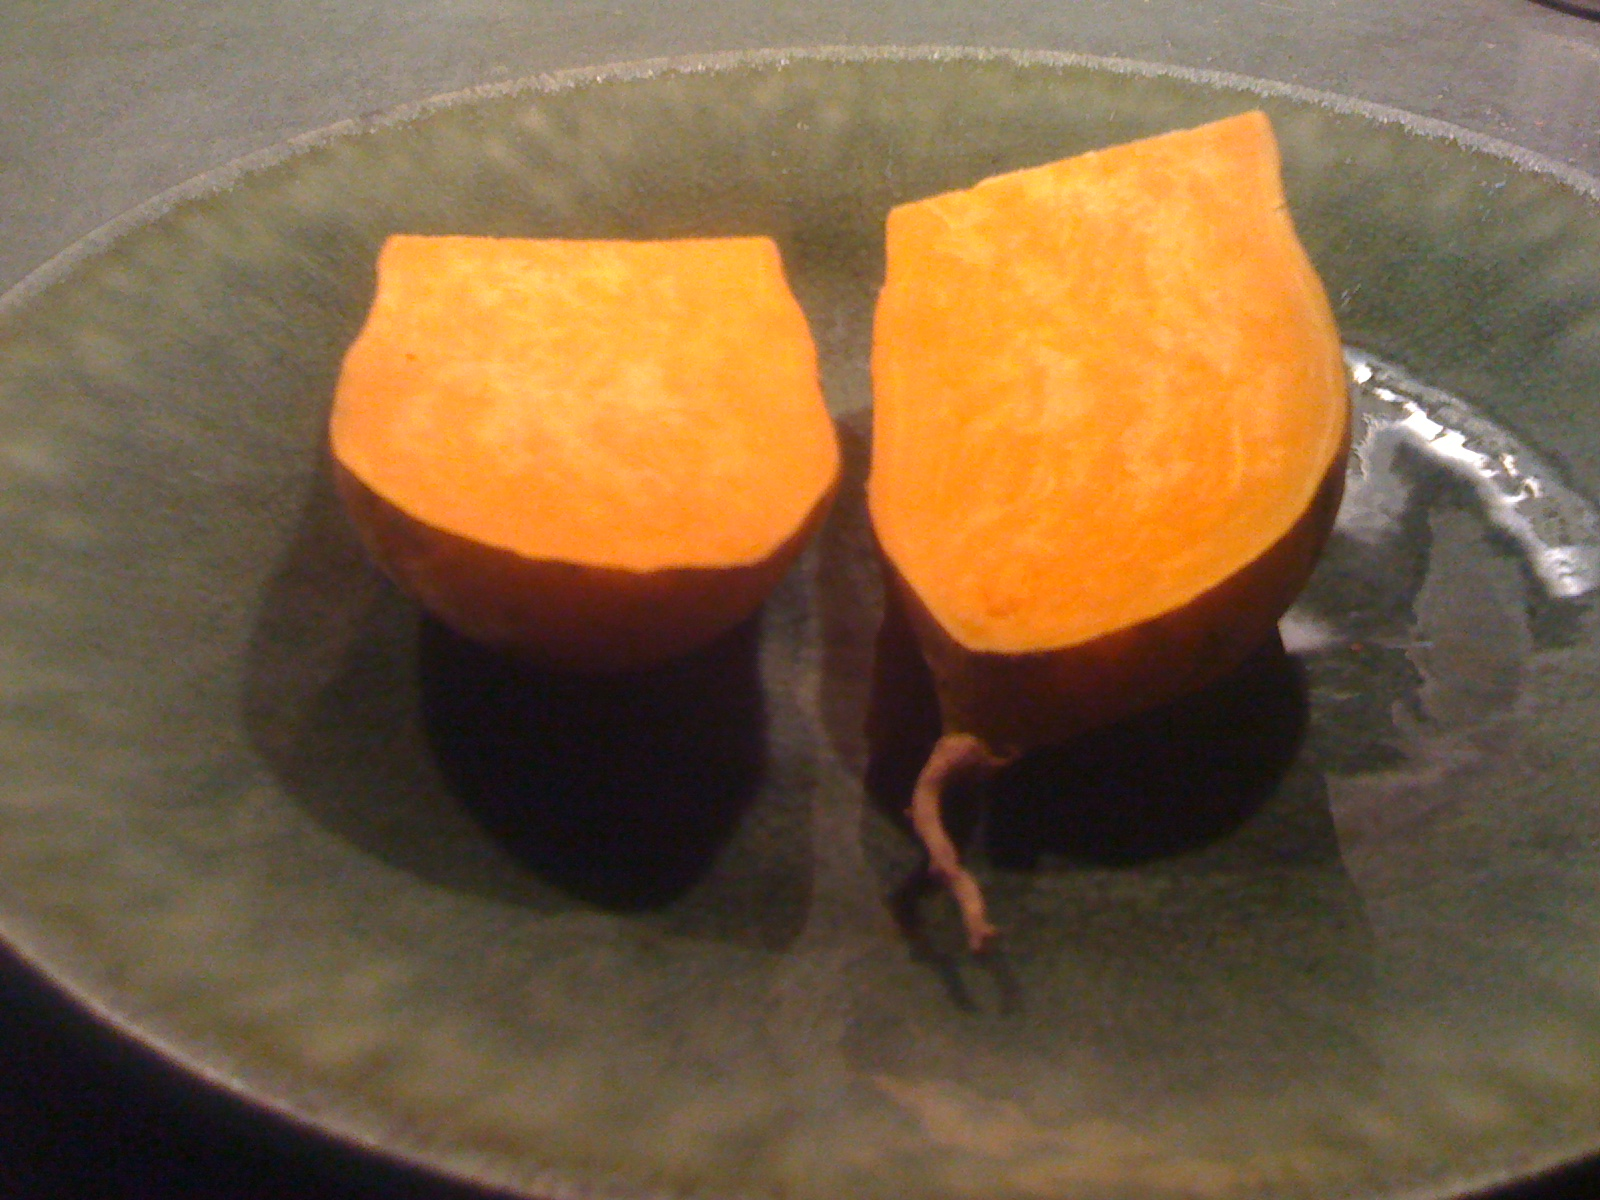 Sweet potato, split side view